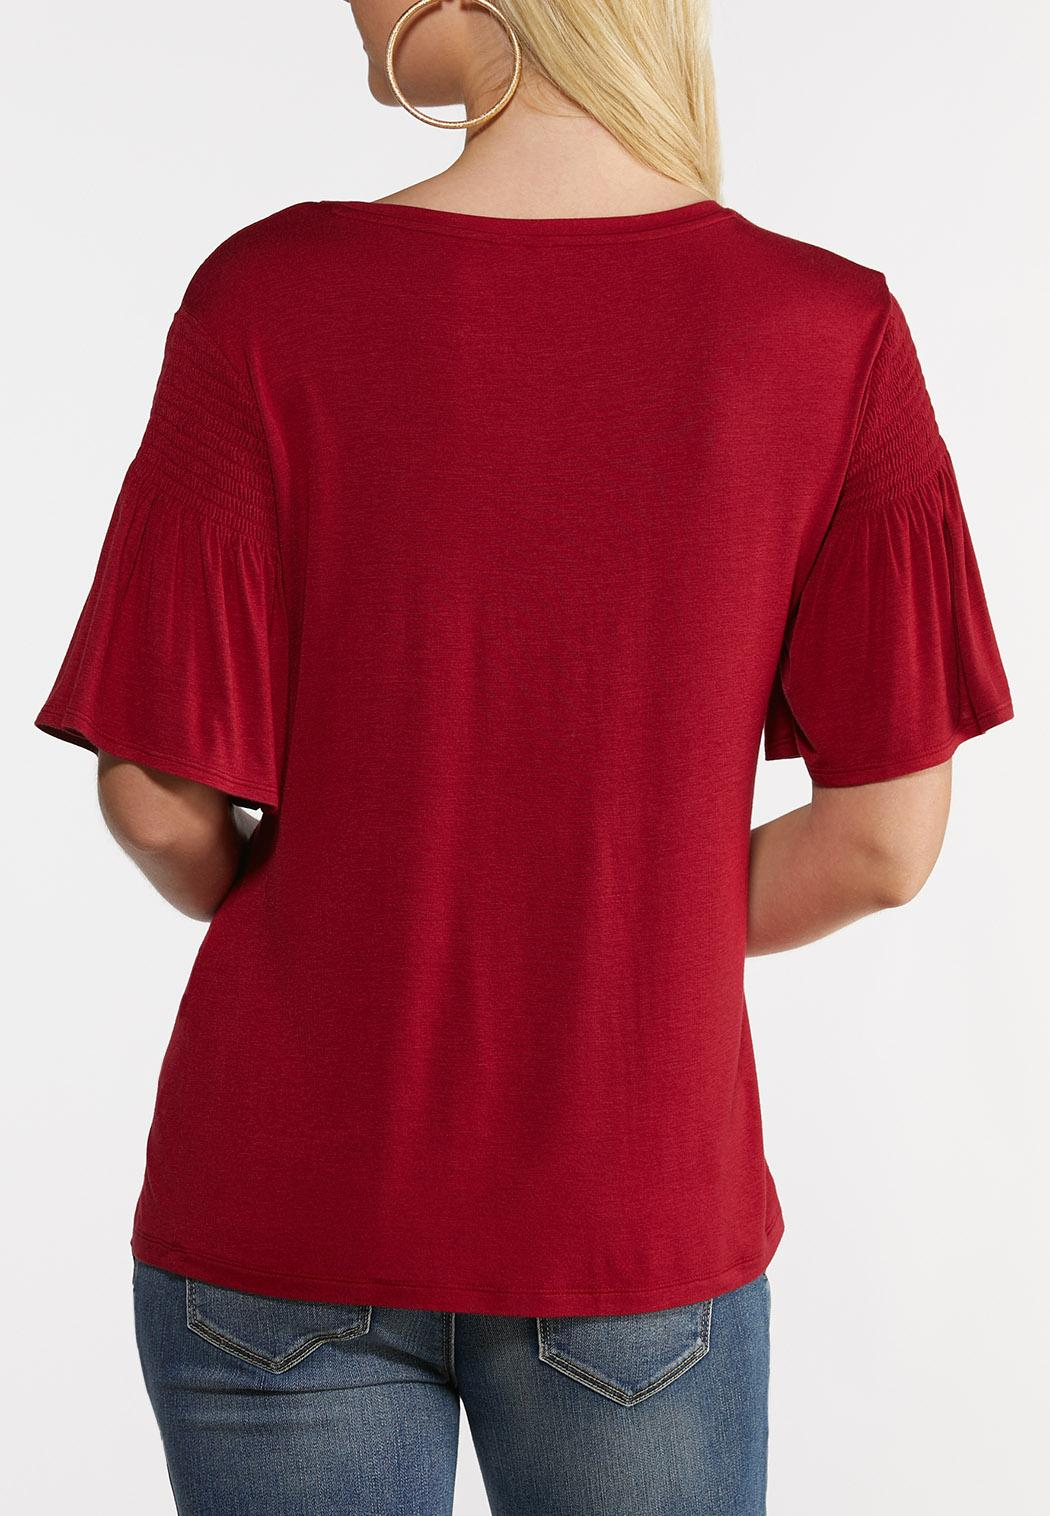 Solid Smocked Sleeve Top (Item #44249018)